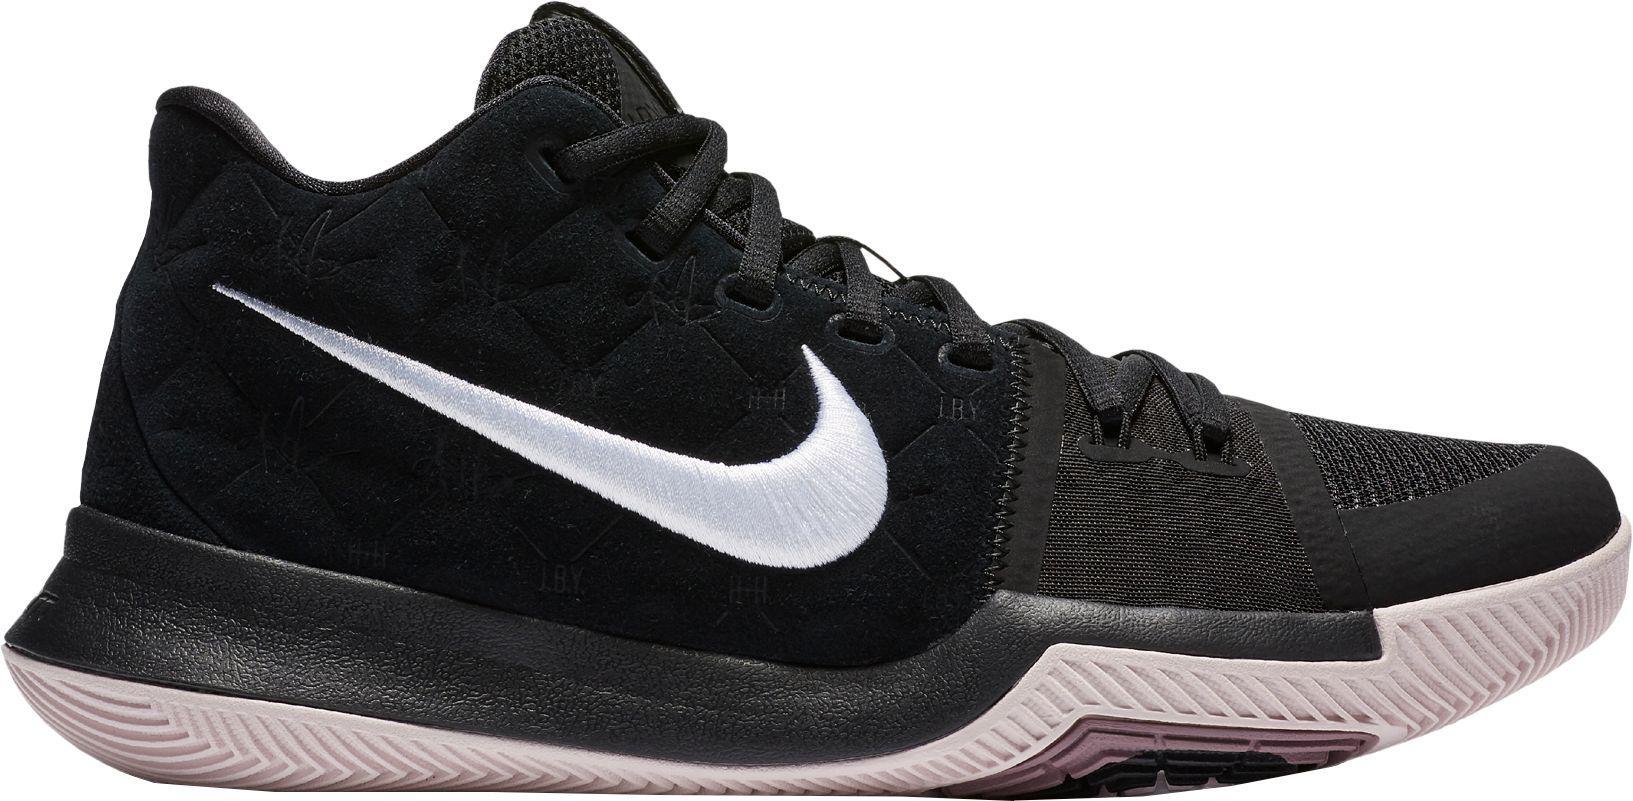 11850a2df7b ... cheap nike black kyrie 3 basketball shoes for men lyst ab3a2 b4c8f